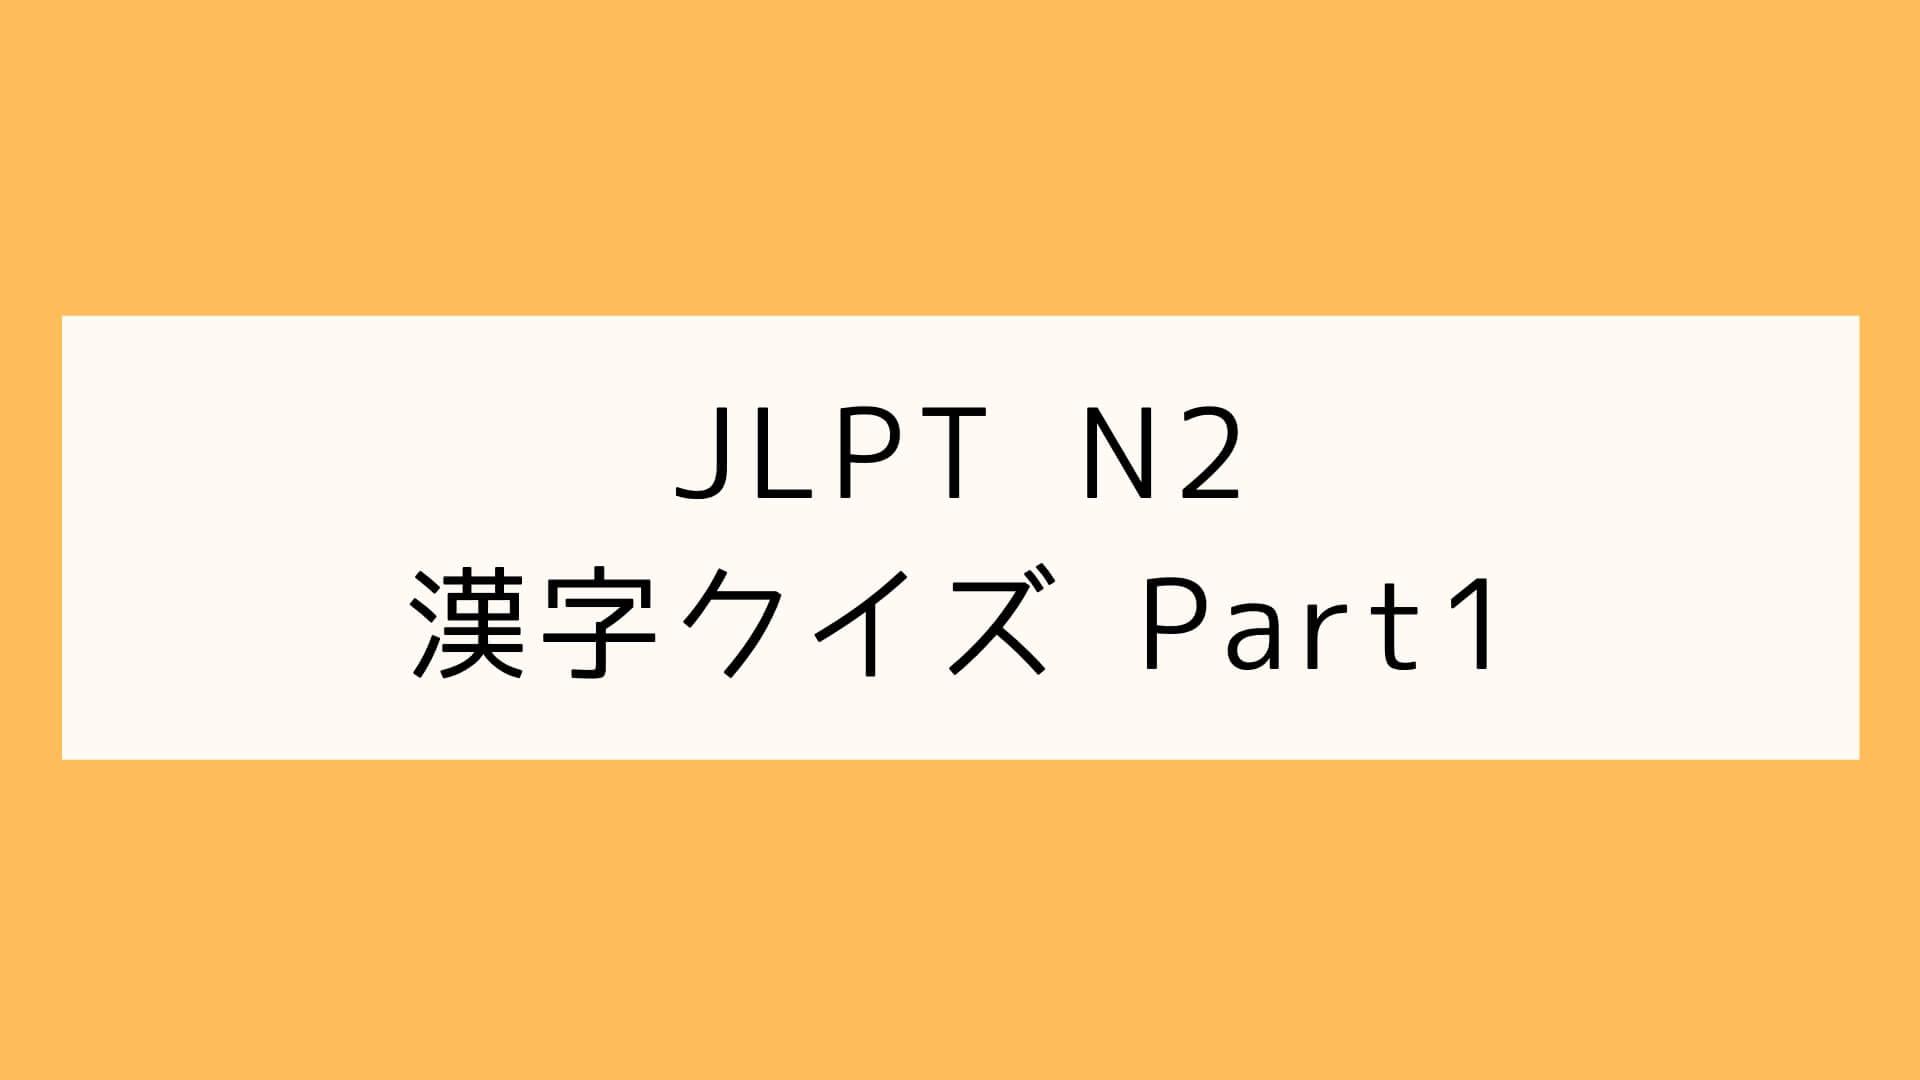 【JLPT N2】漢字クイズ Part1